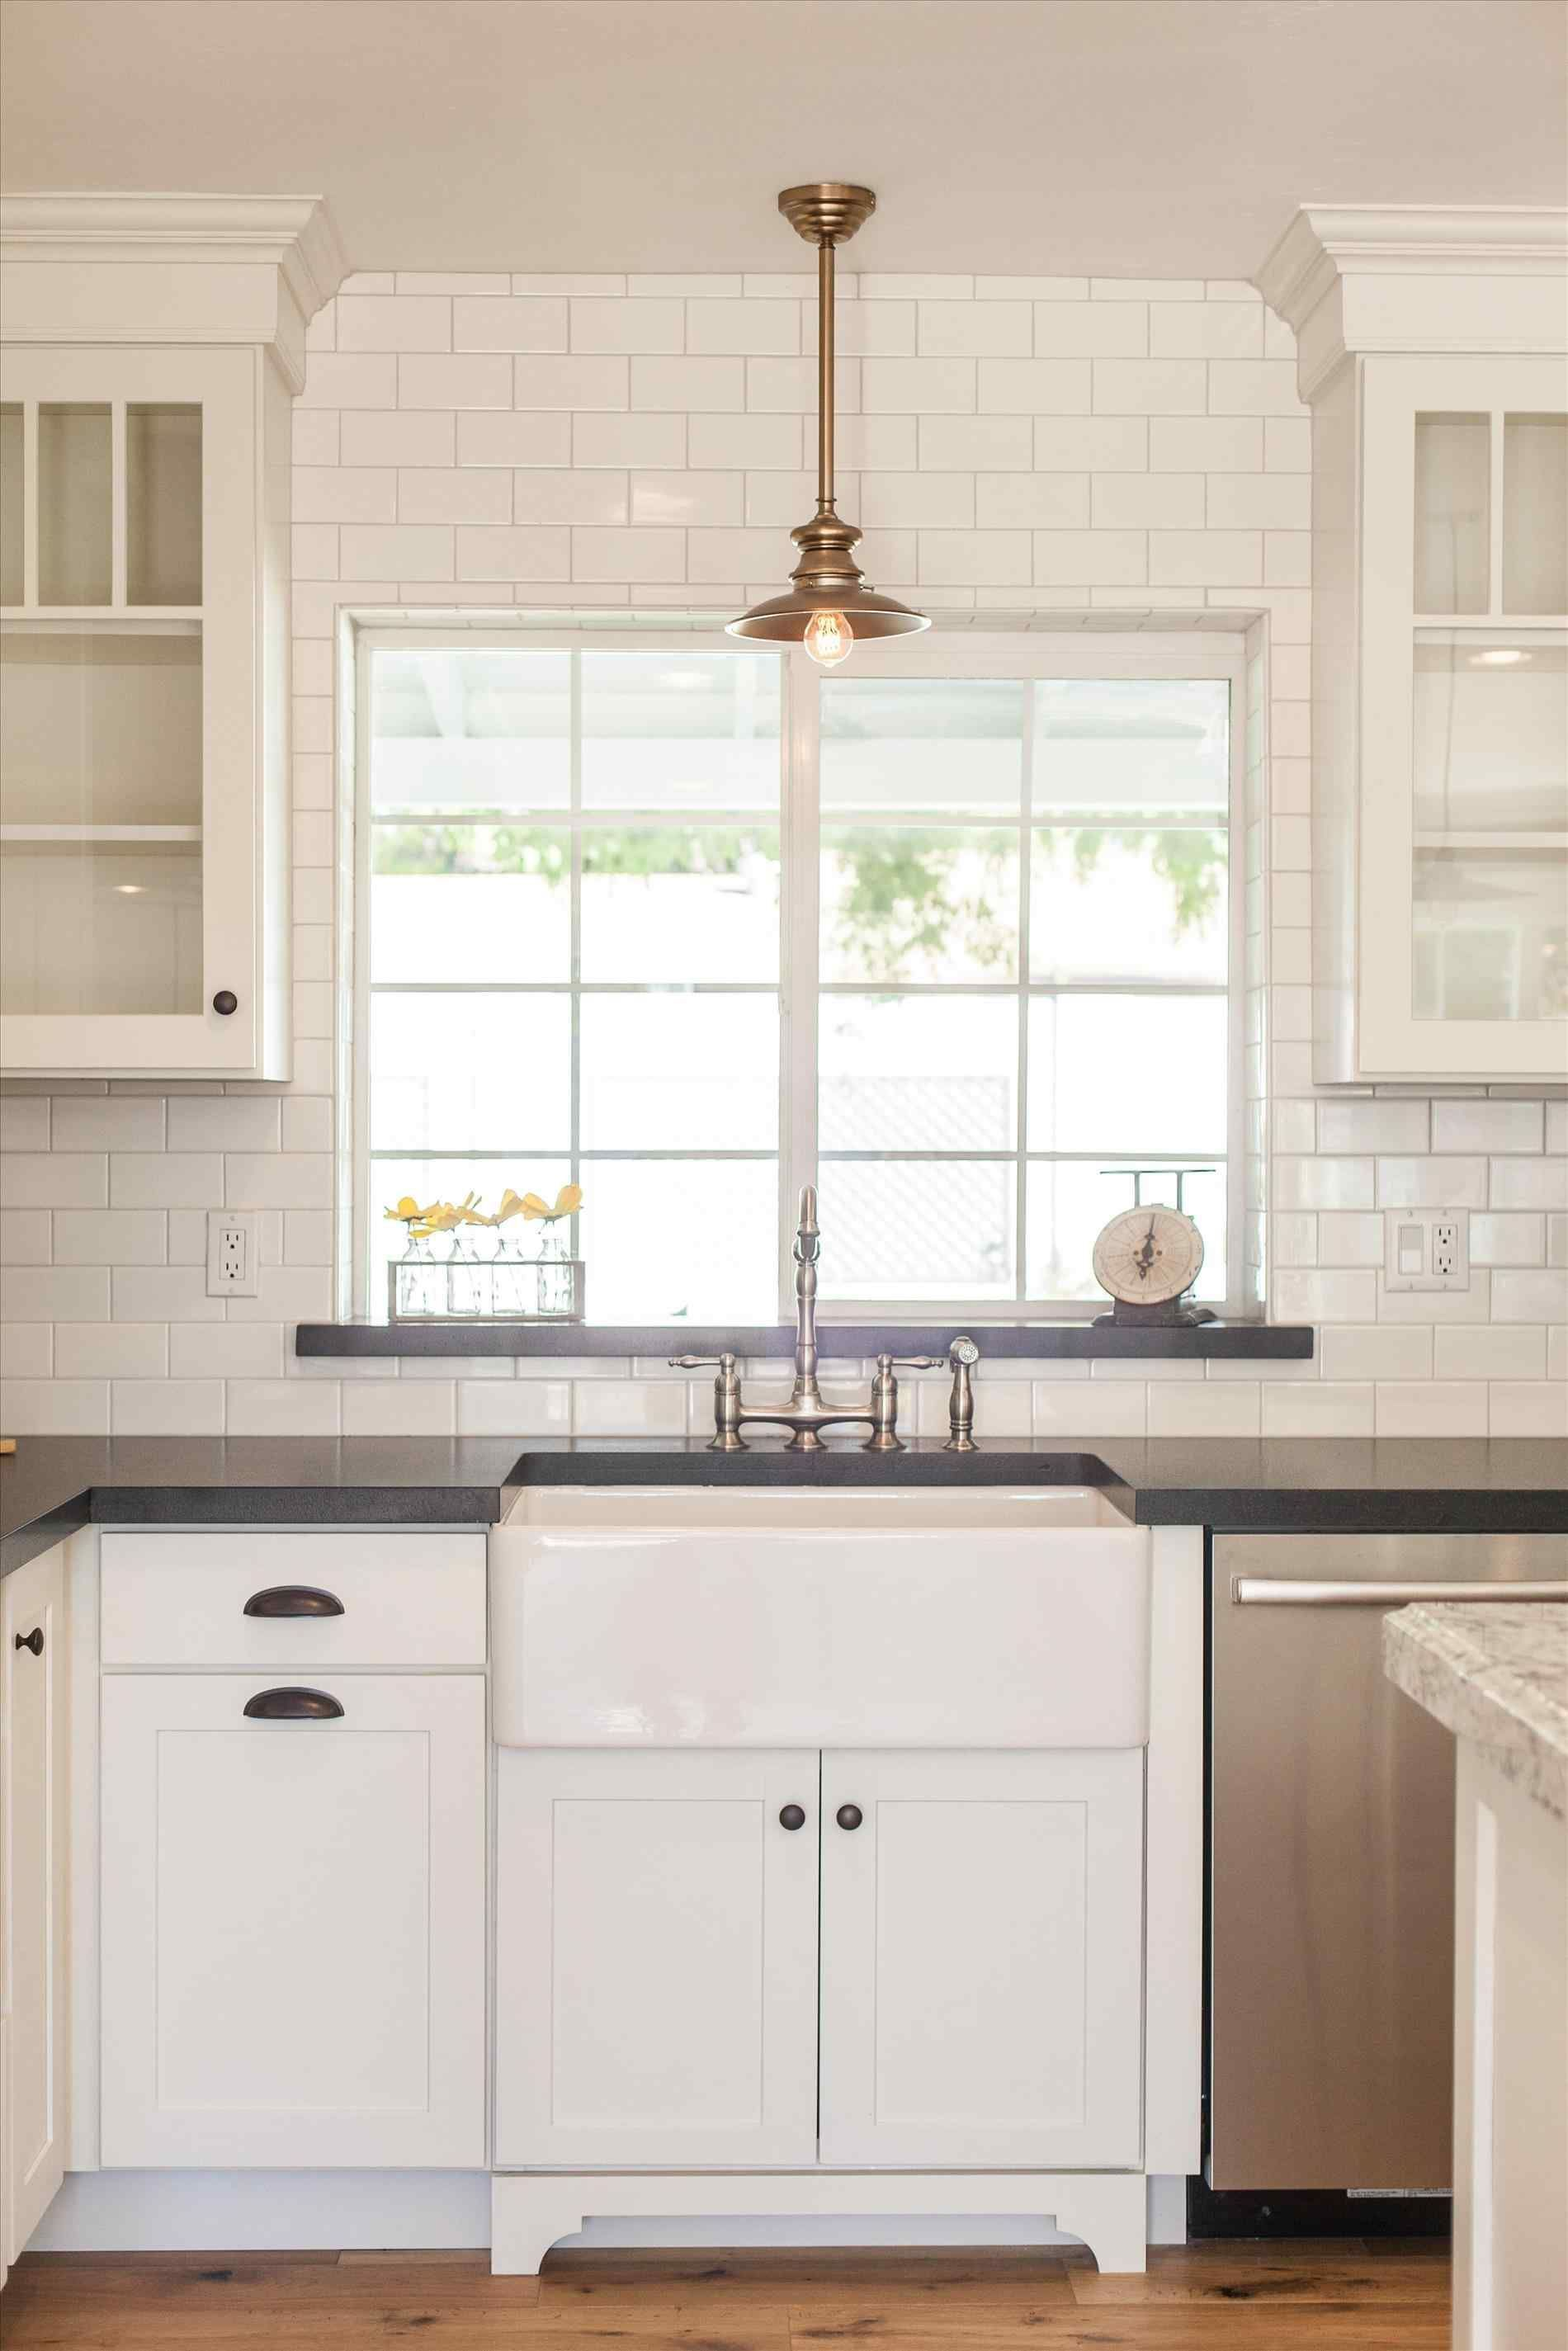 34 Enchanting Metro Tiles Photo Decortez Rustic Kitchen Sinks Small Kitchen Backsplash Kitchen Sink Lighting